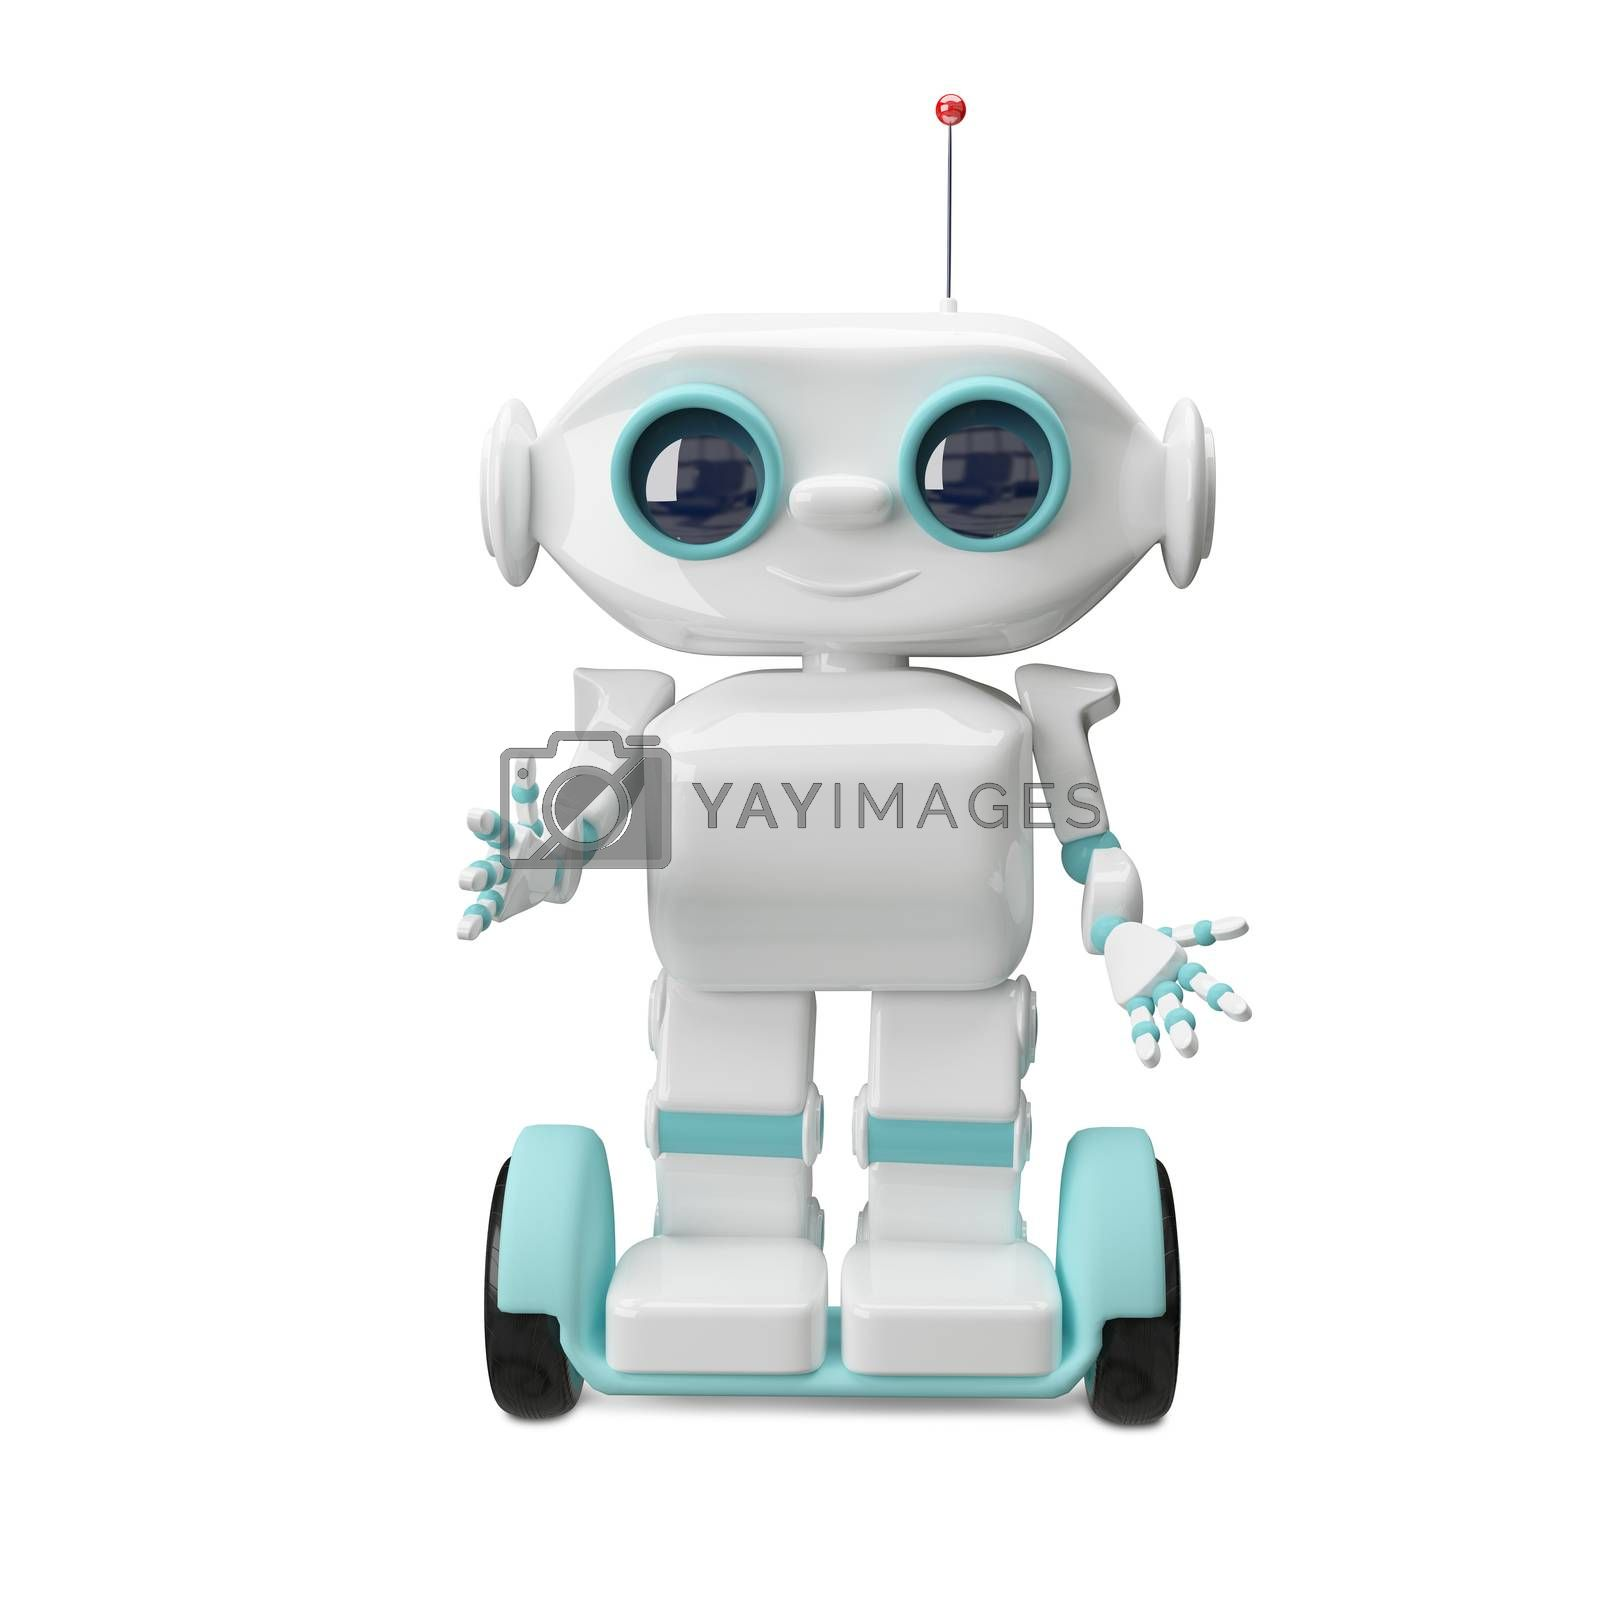 3d Illustration White Robot on Scooter on a Transparent Background